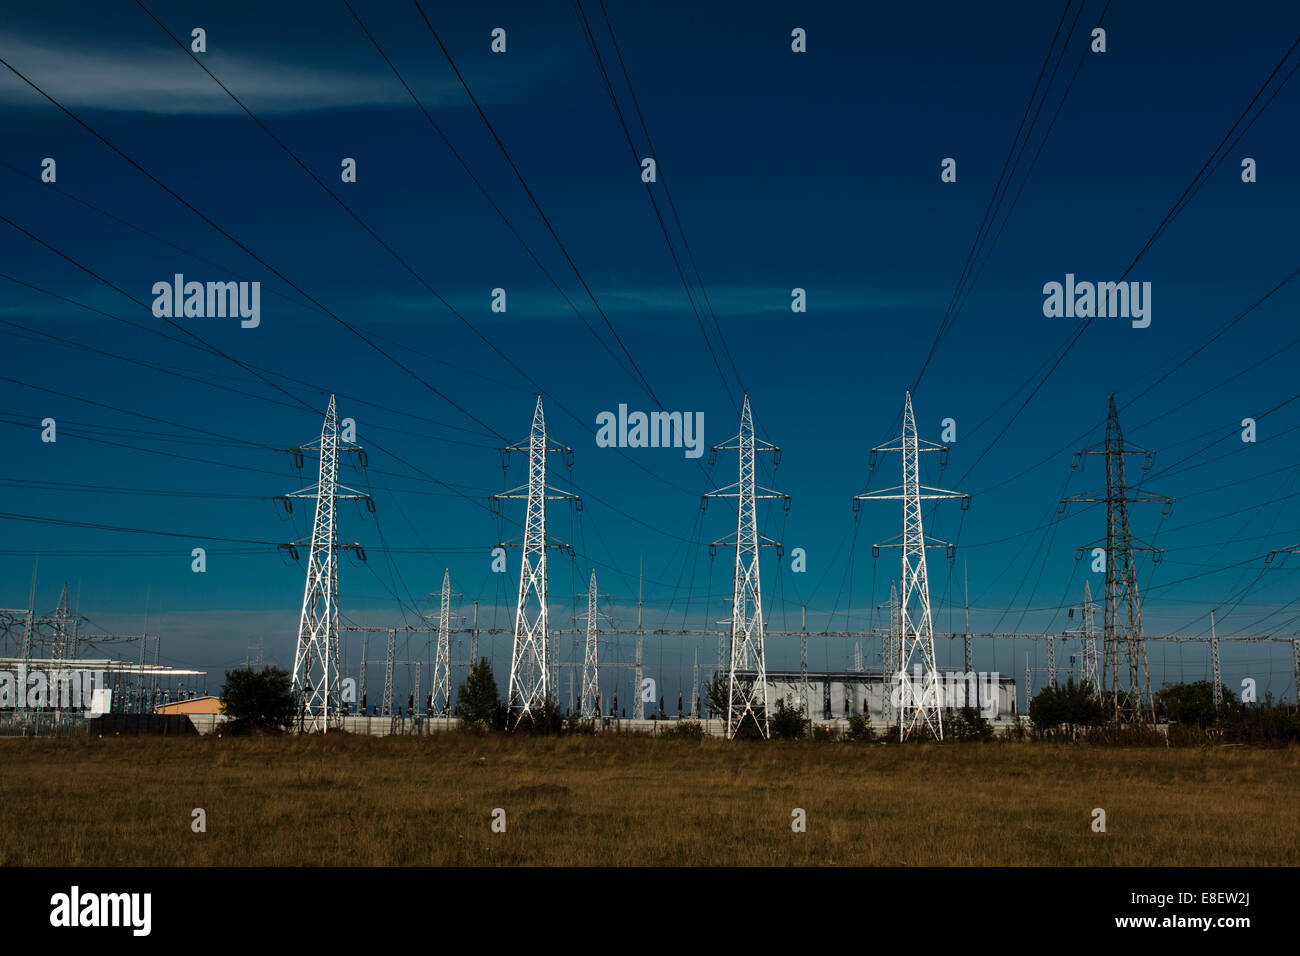 Strom-Stromleitungen Stockbild